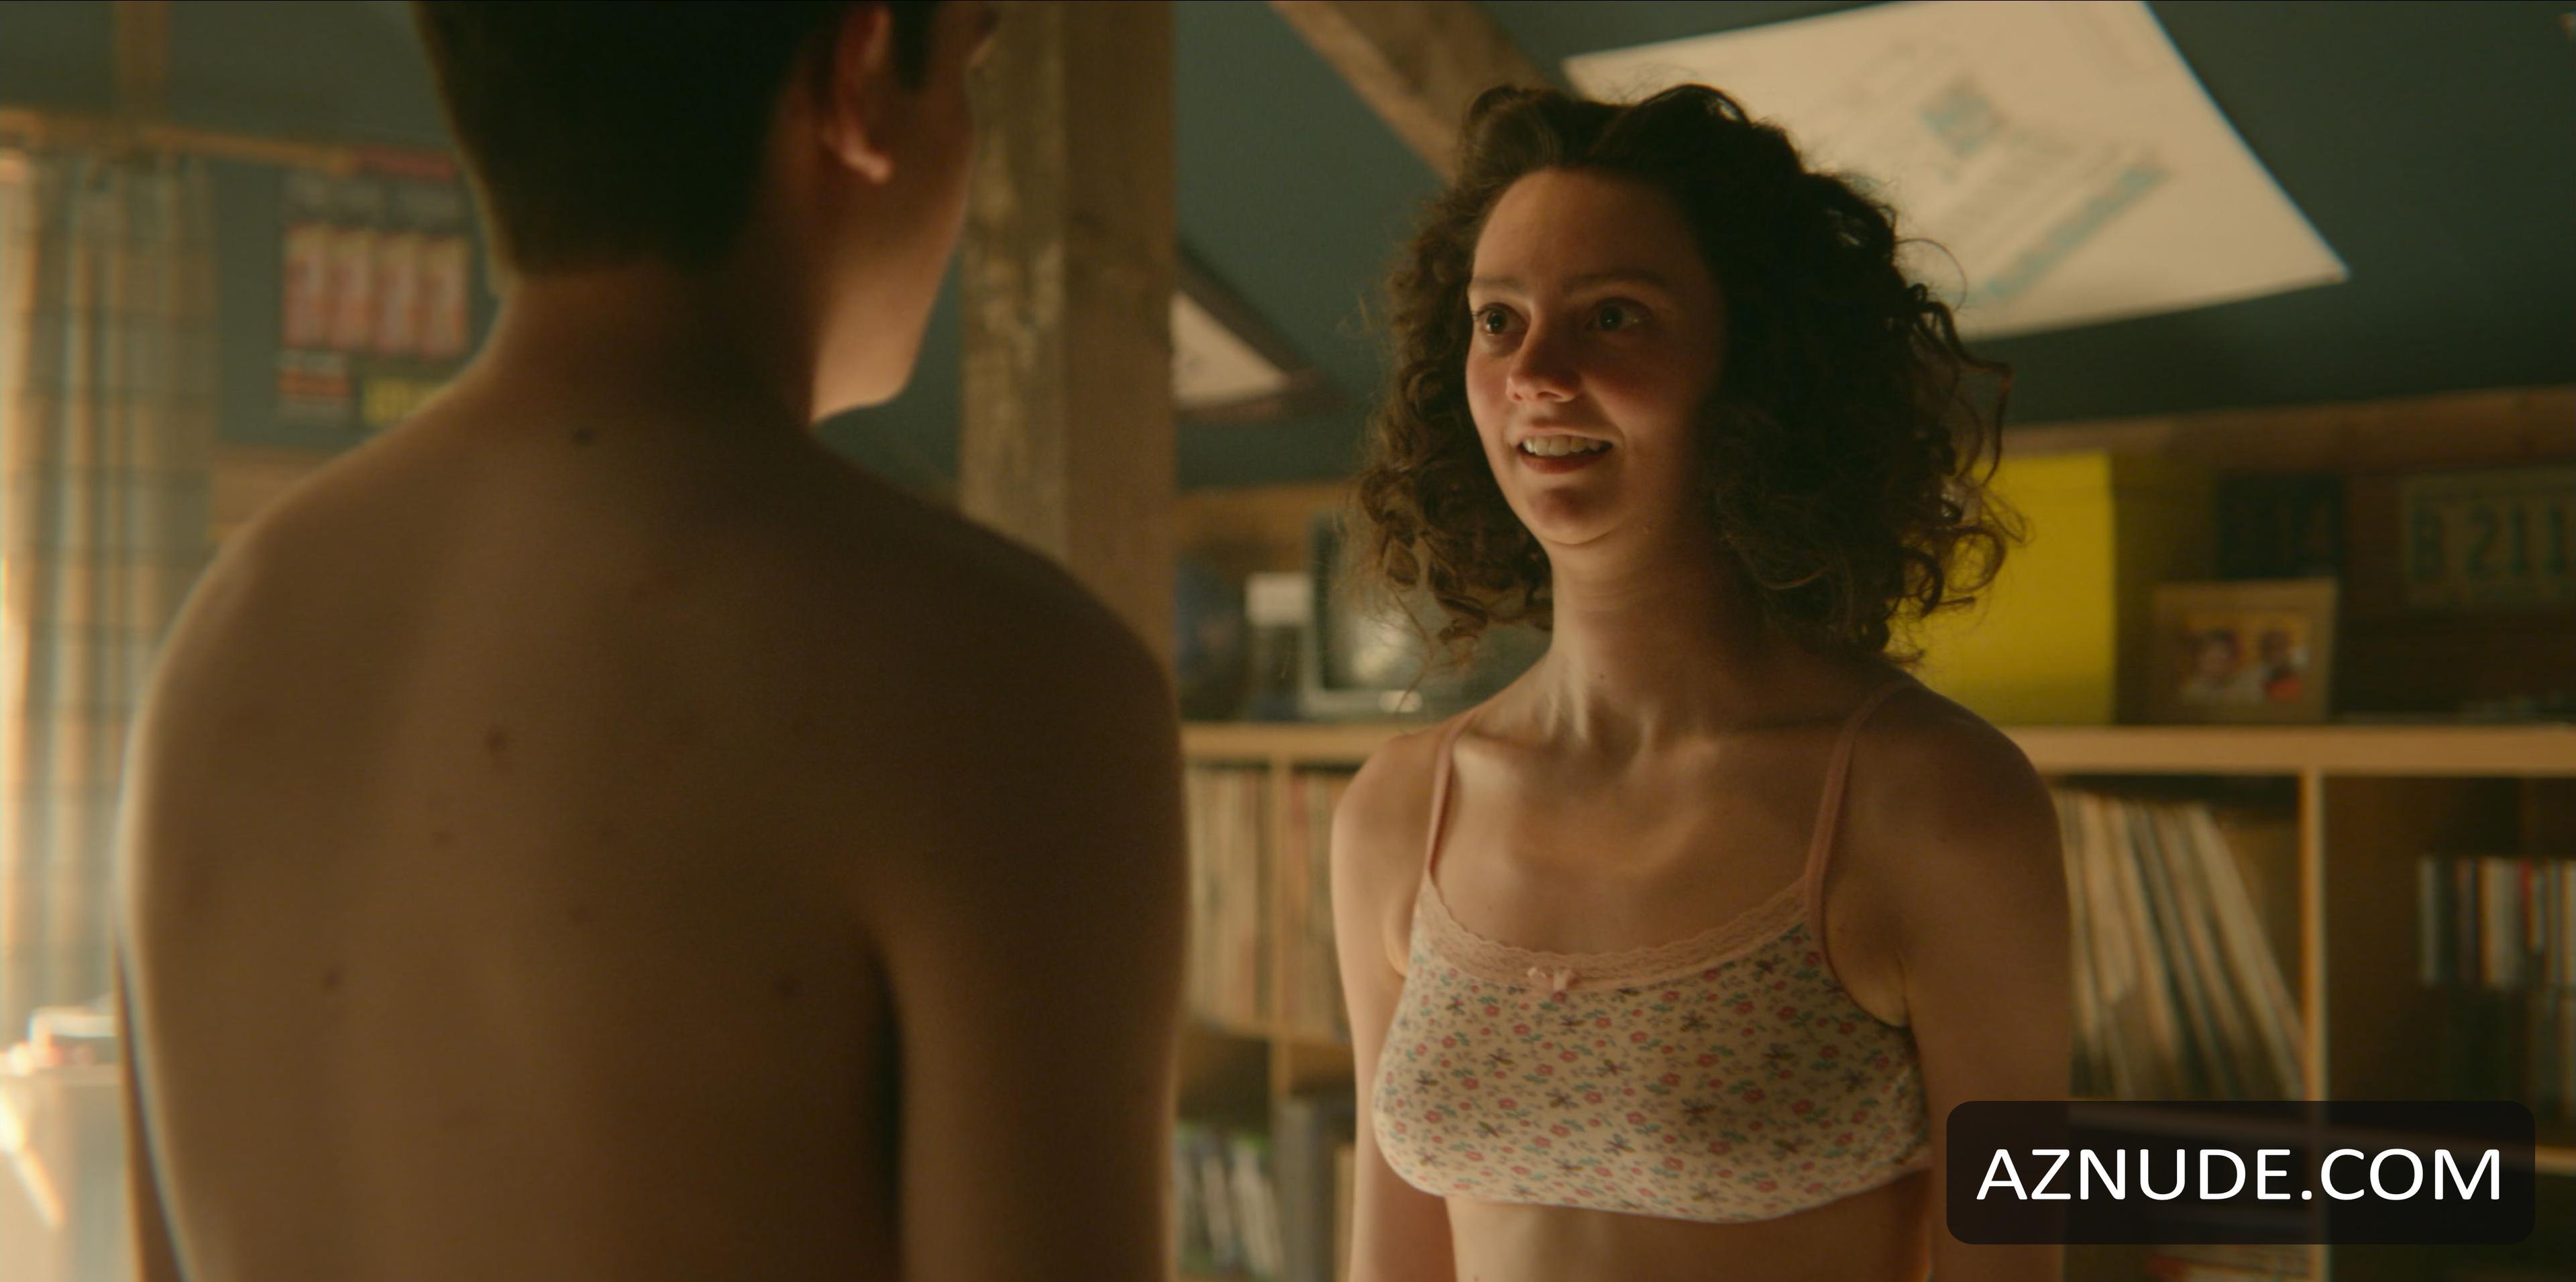 Sandra bullok nude or haveing sex